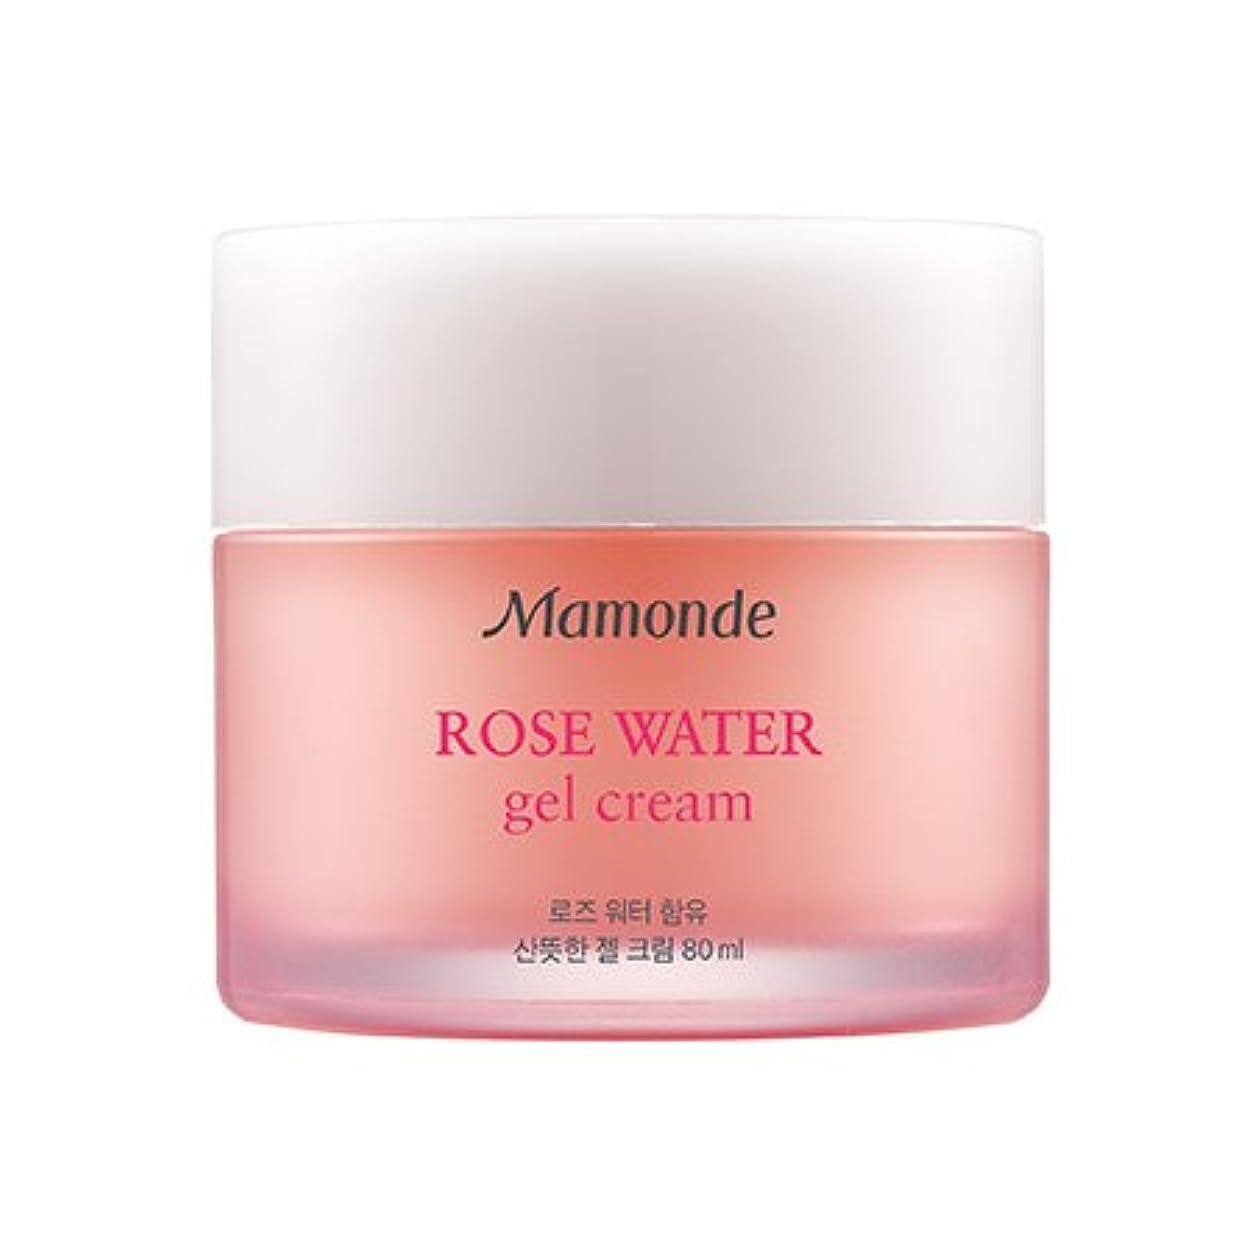 Mamonde Rose Water Gel Cream 80ml/マモンド ローズ ウォーター ジェル クリーム 80ml [並行輸入品]